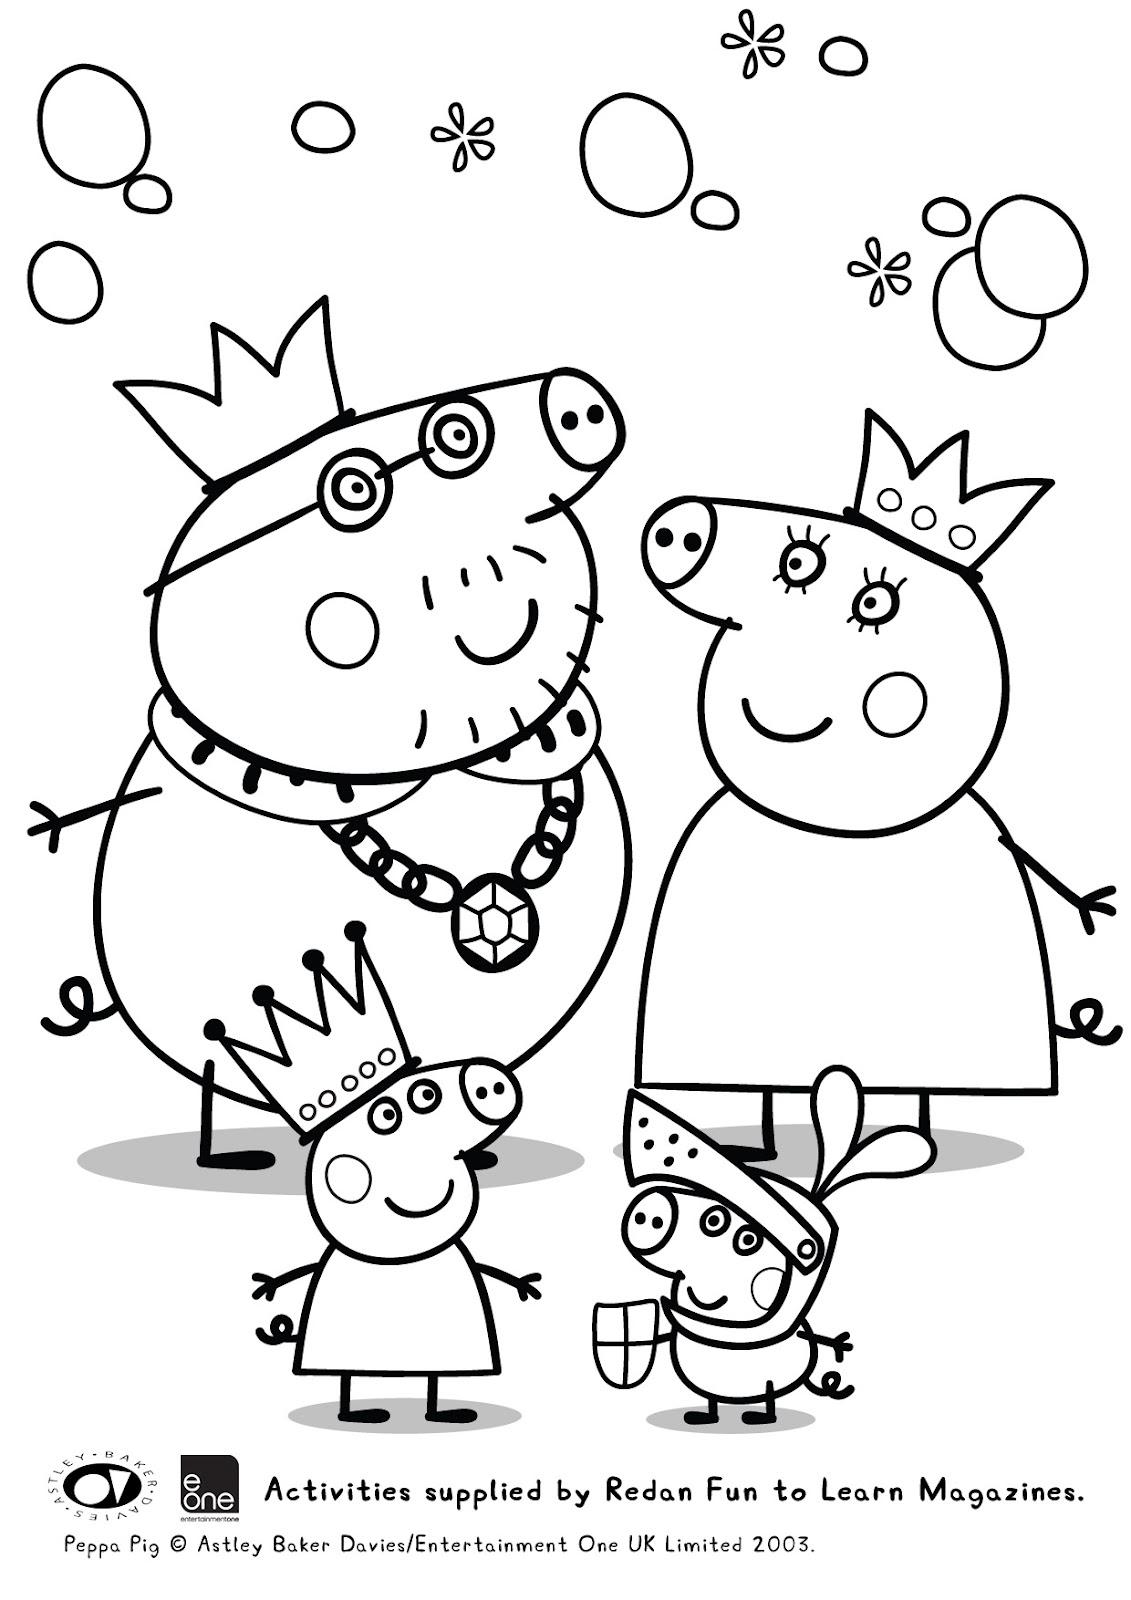 Giochi Di Peppa Pig Colorare.Zuppa Ricetta Disegno Di Peppa Pig